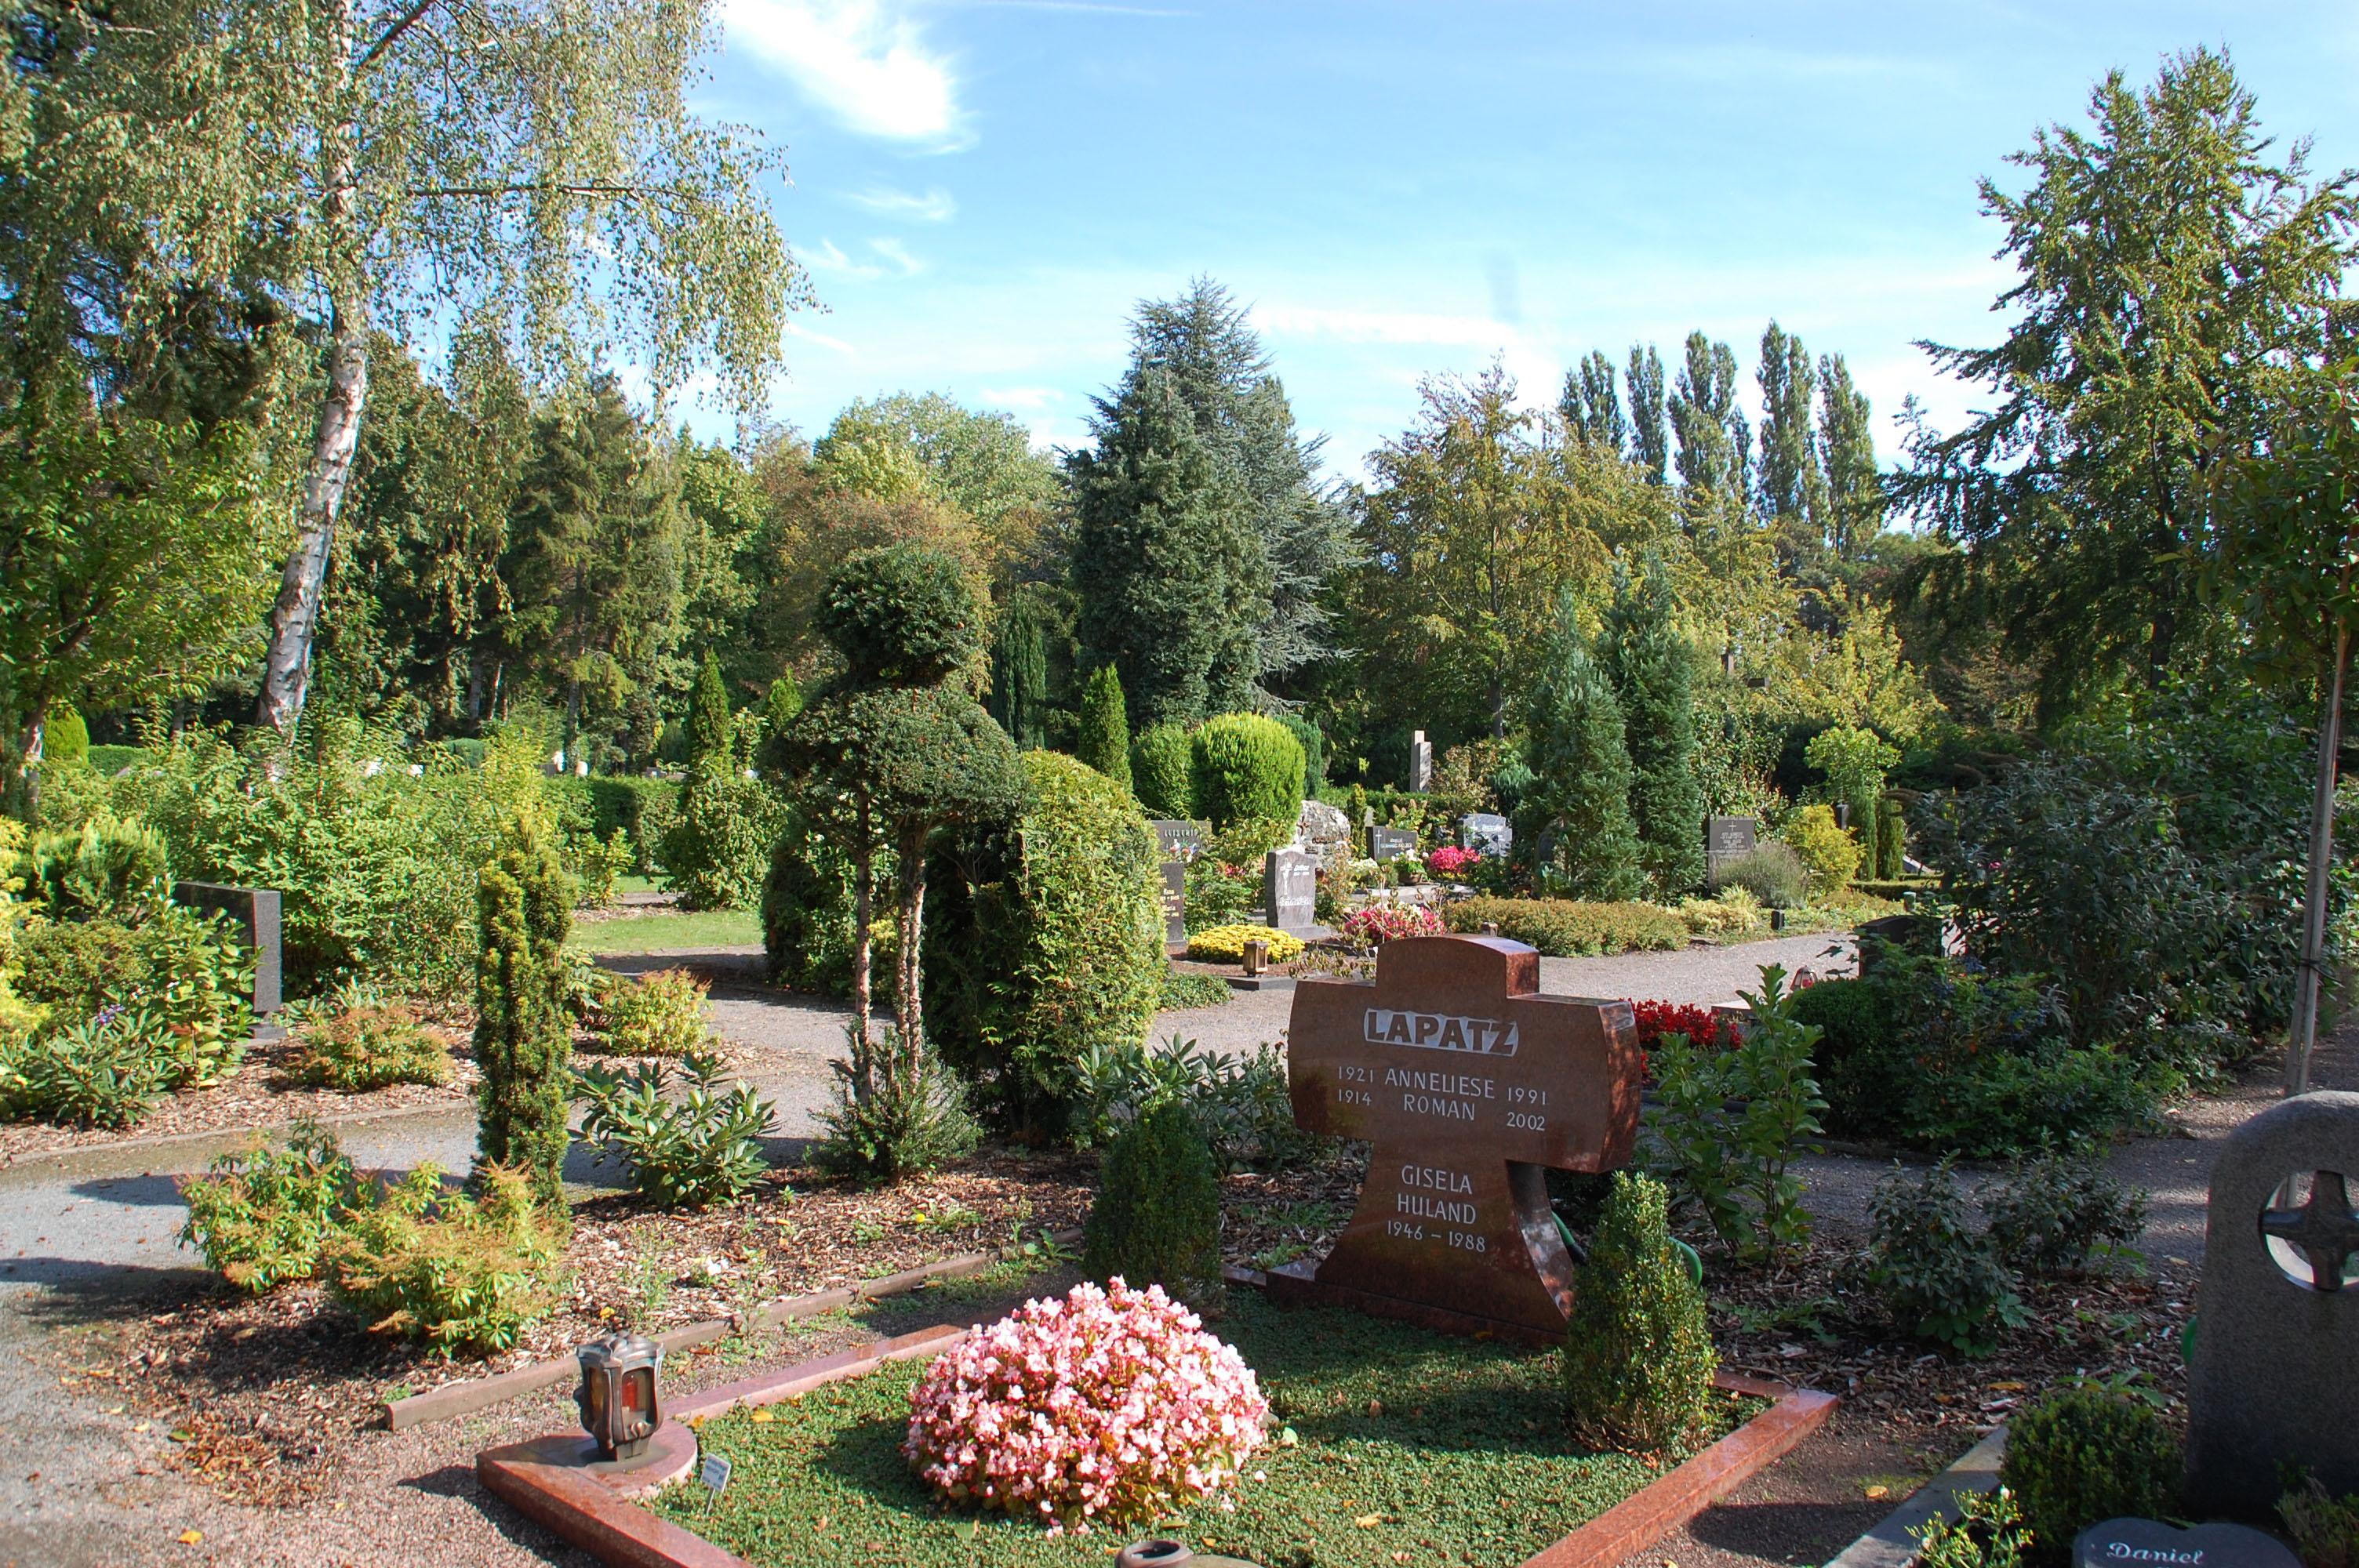 File:Alt-Hürth Friedhof 01.jpg - Wikimedia Commons